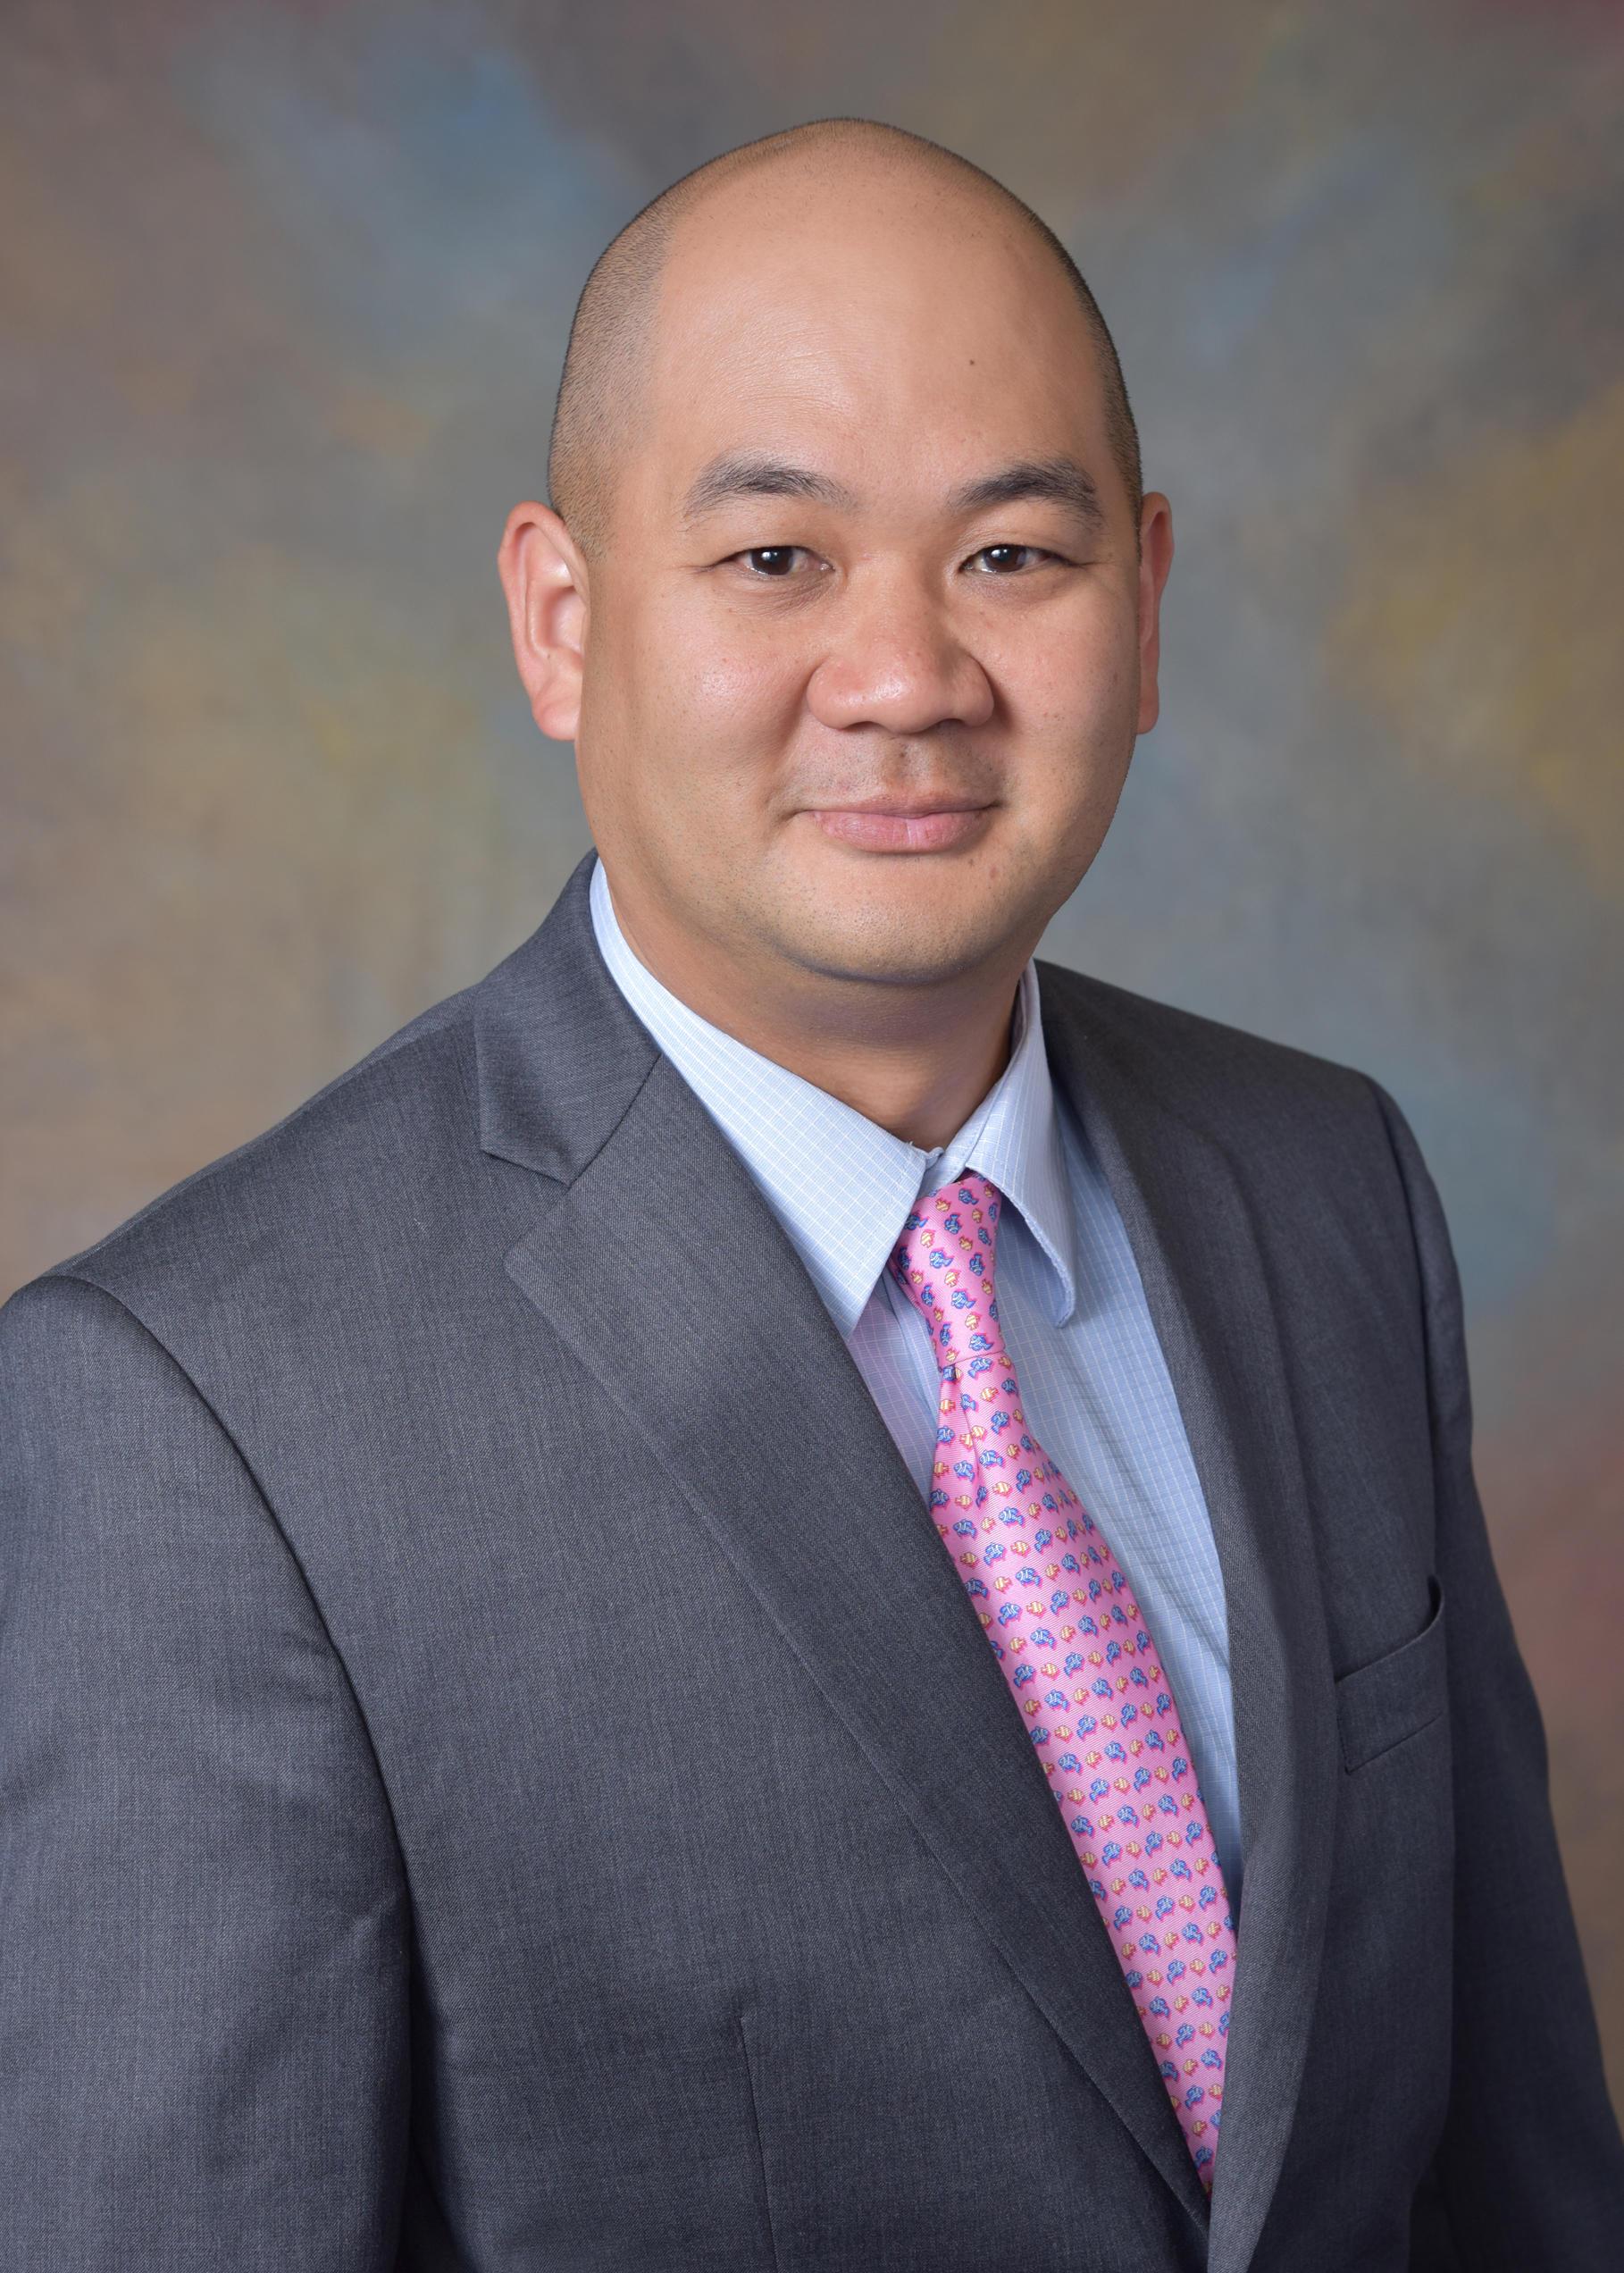 Gregory Chang PA